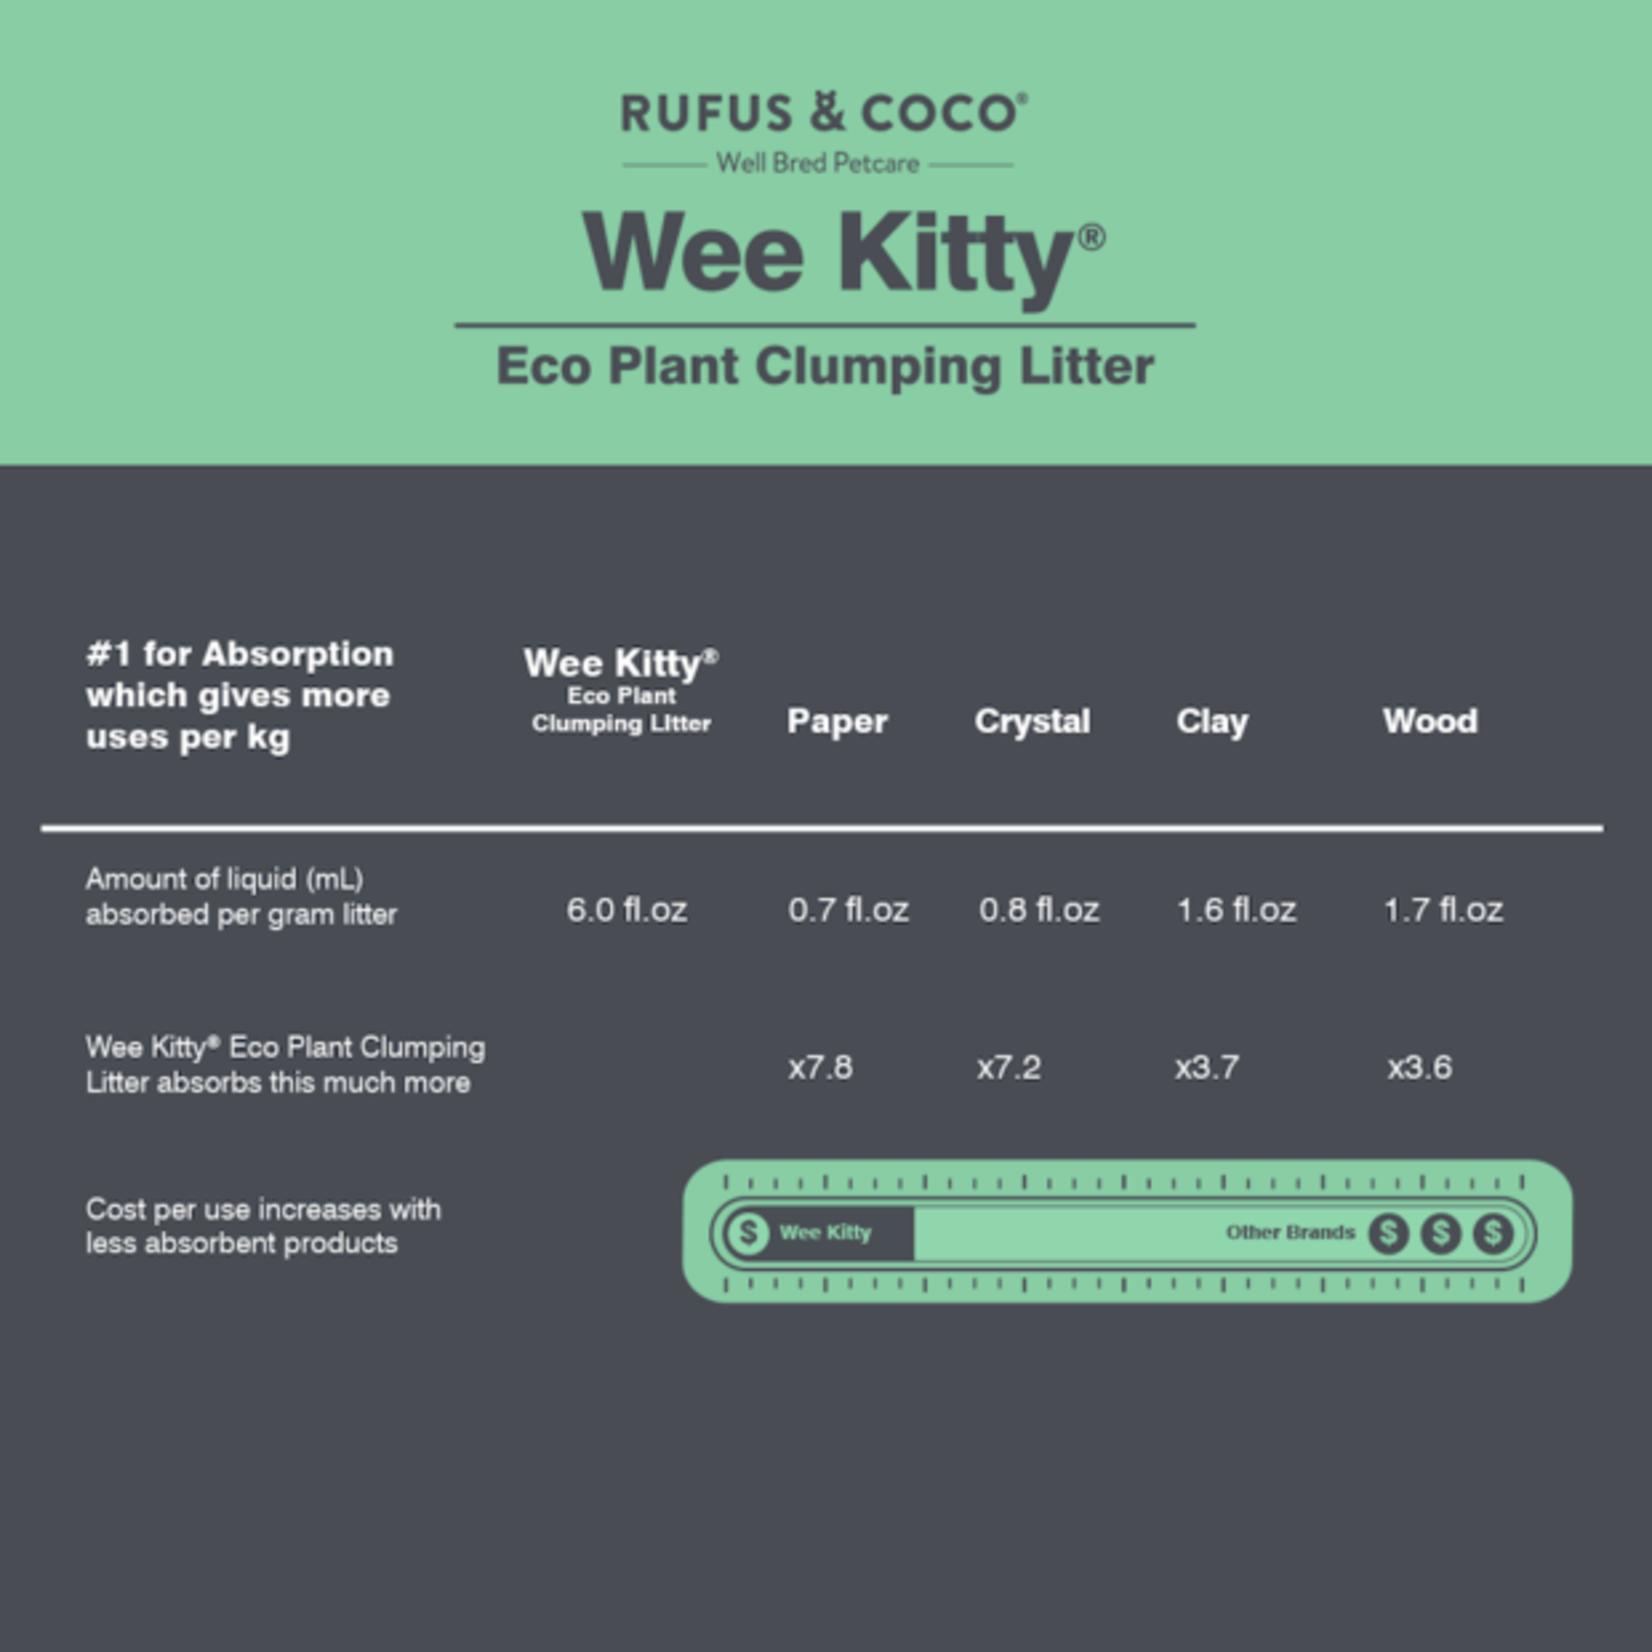 Rufus & Coco Soybean Fibers Cat Litter - Clumping - Rufus & Coco 4kg